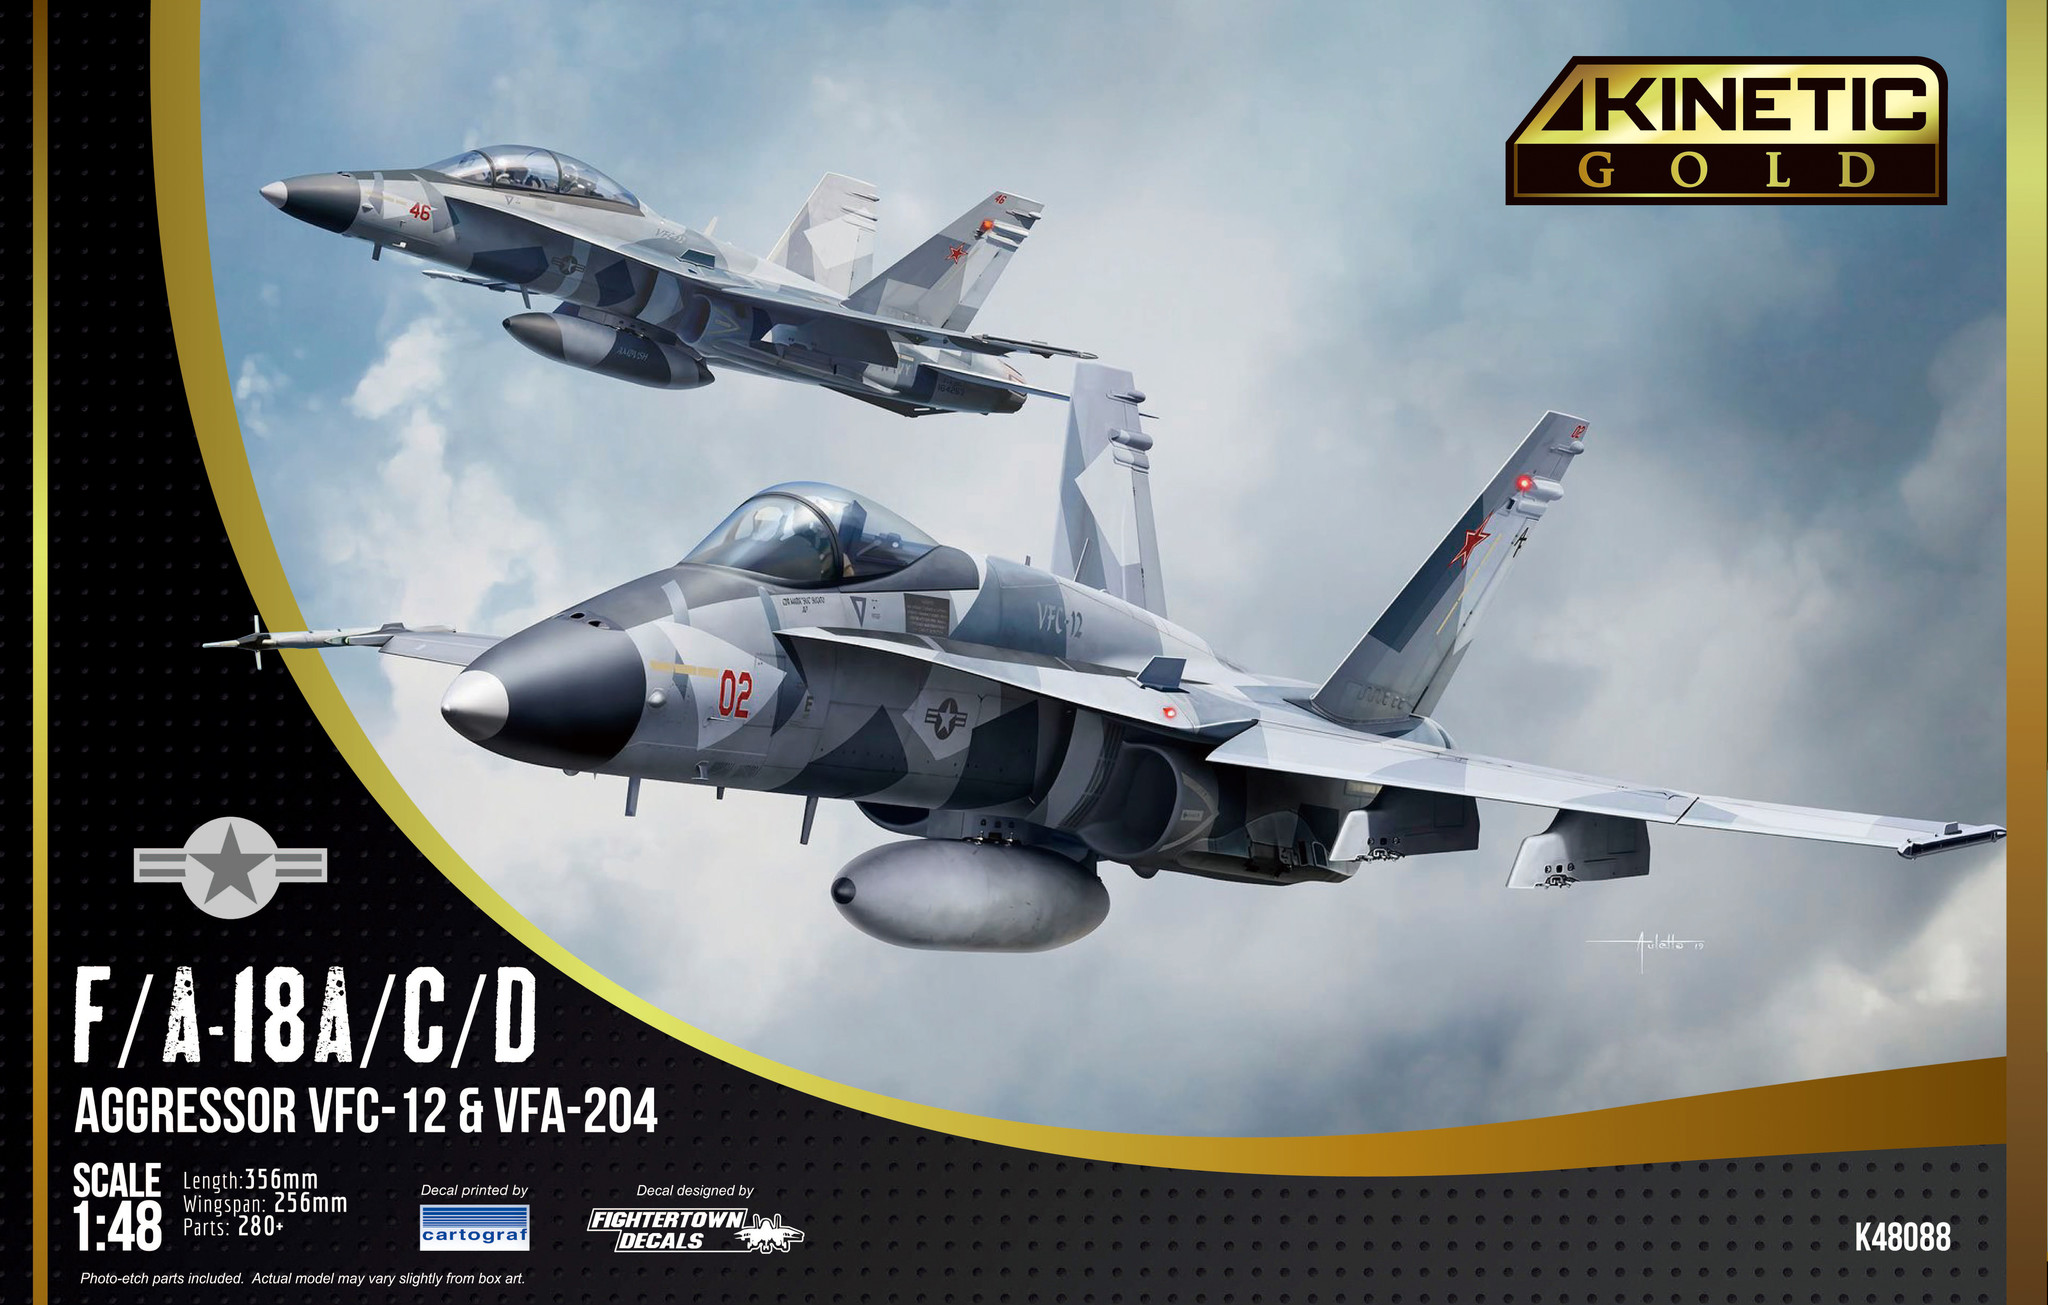 Kinetic F/A-18A/D Vfc-112 Aggressor - Scale 1/48 - Kinetic - KIN48088